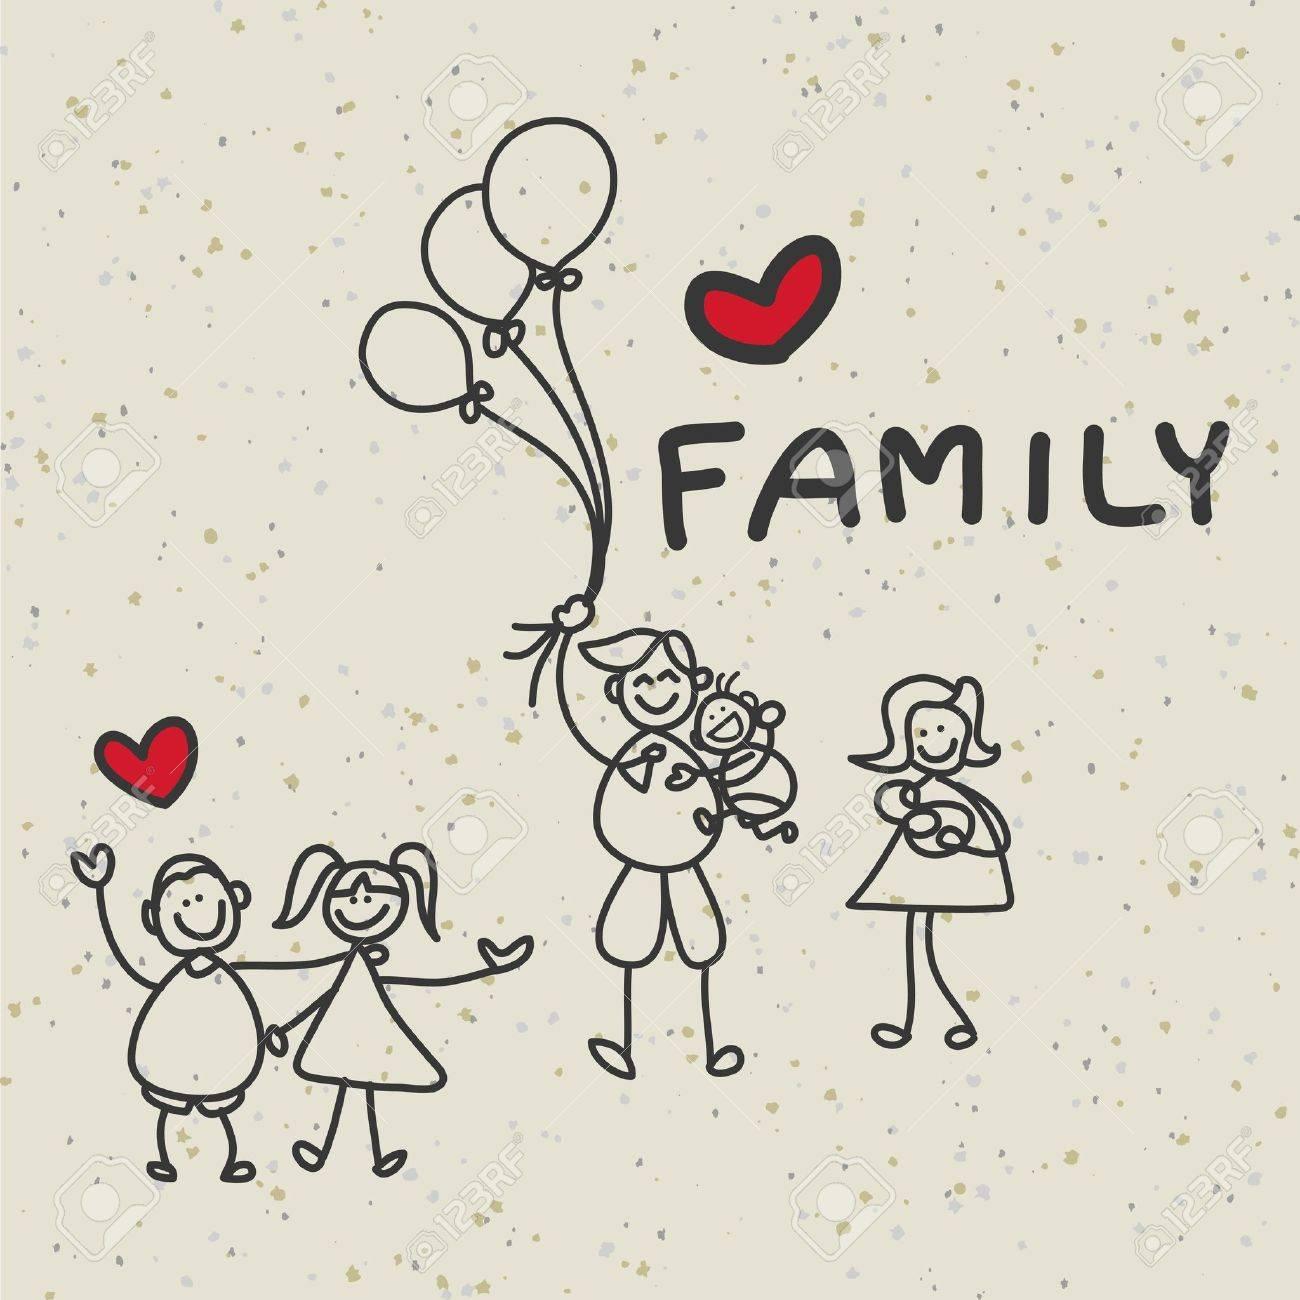 hand drawing cartoon character happy family - 19222466